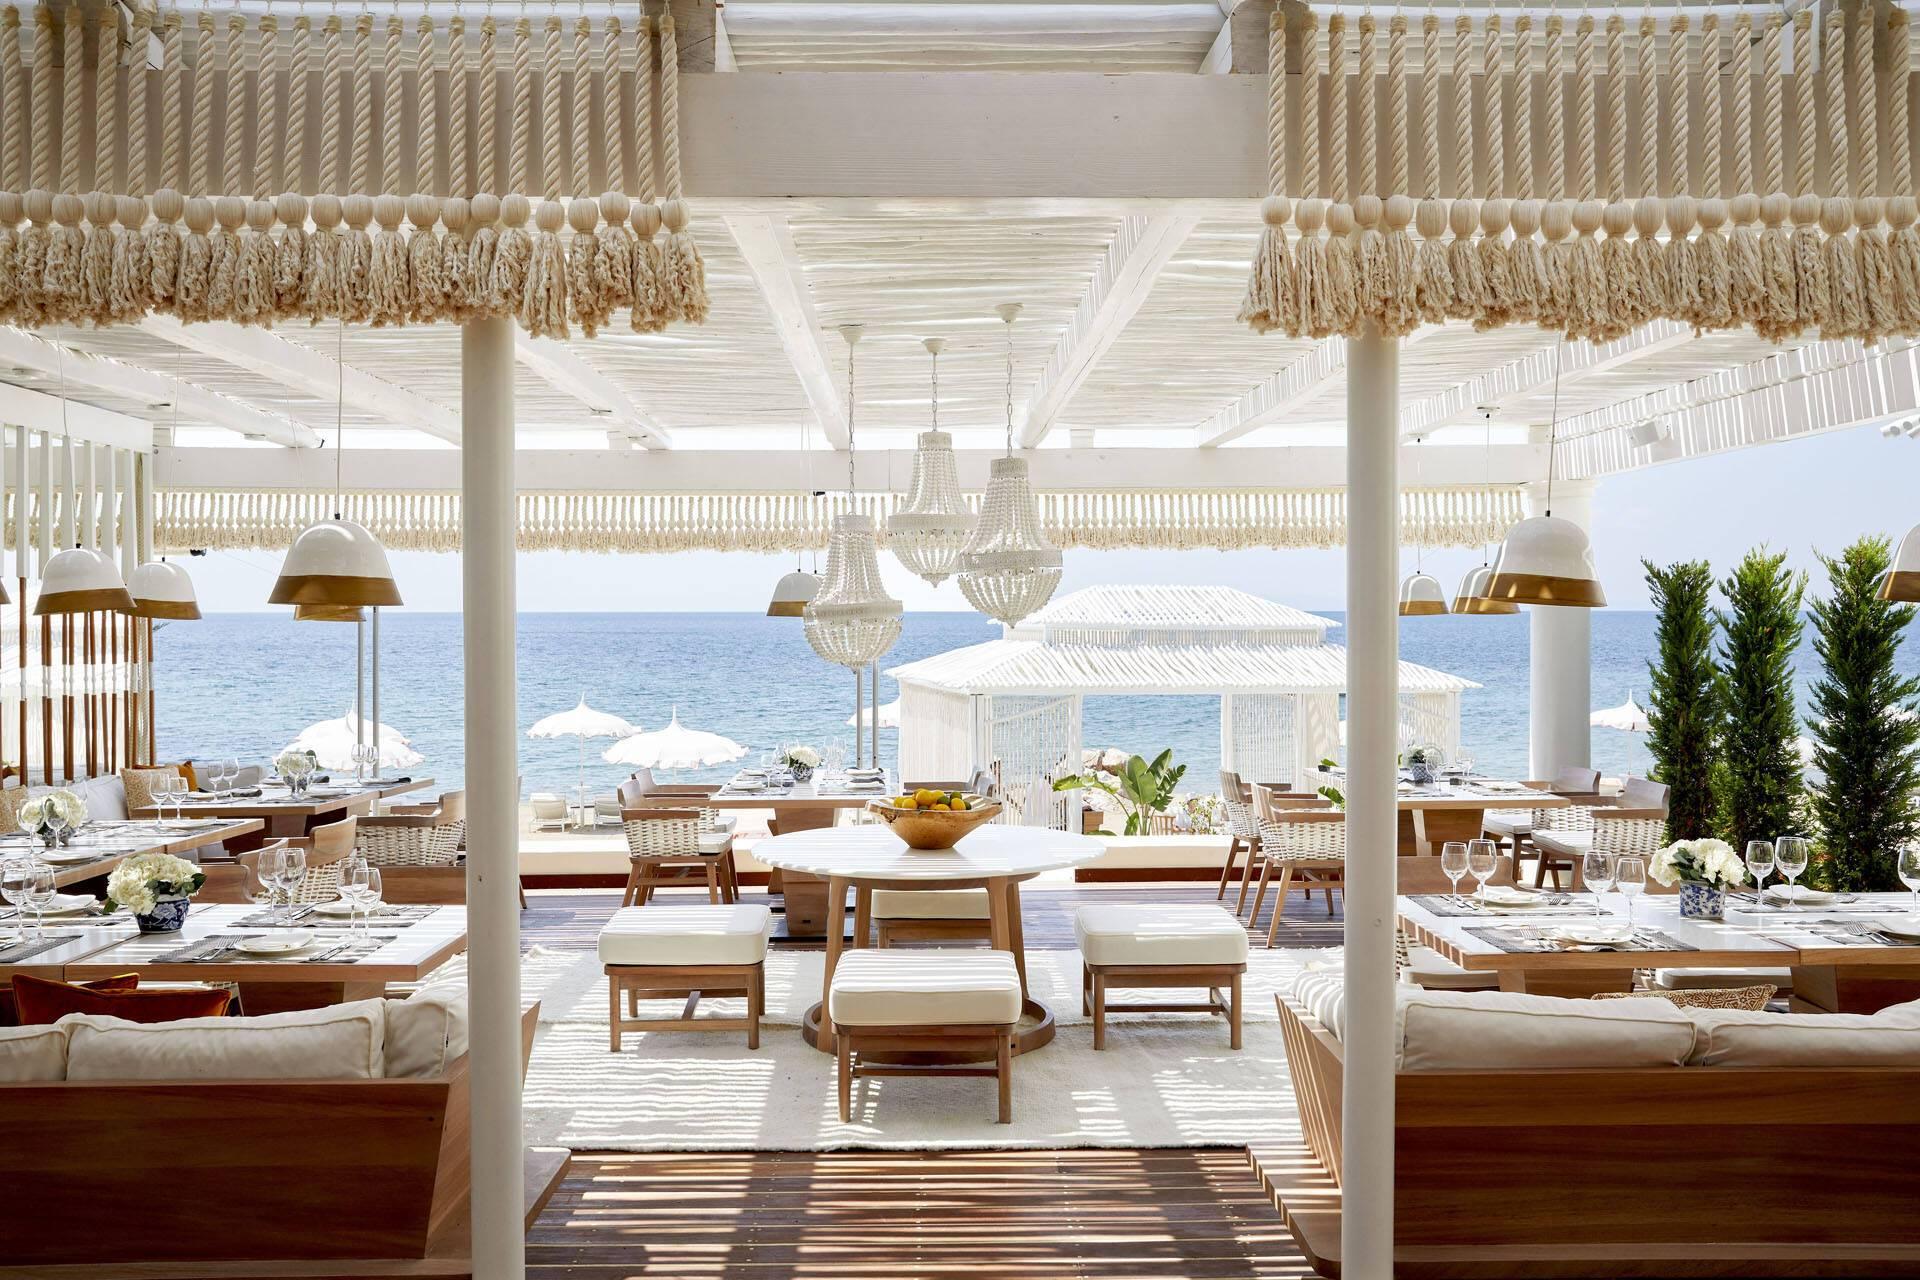 Danai Thessalonique Grece Anithos Restaurant